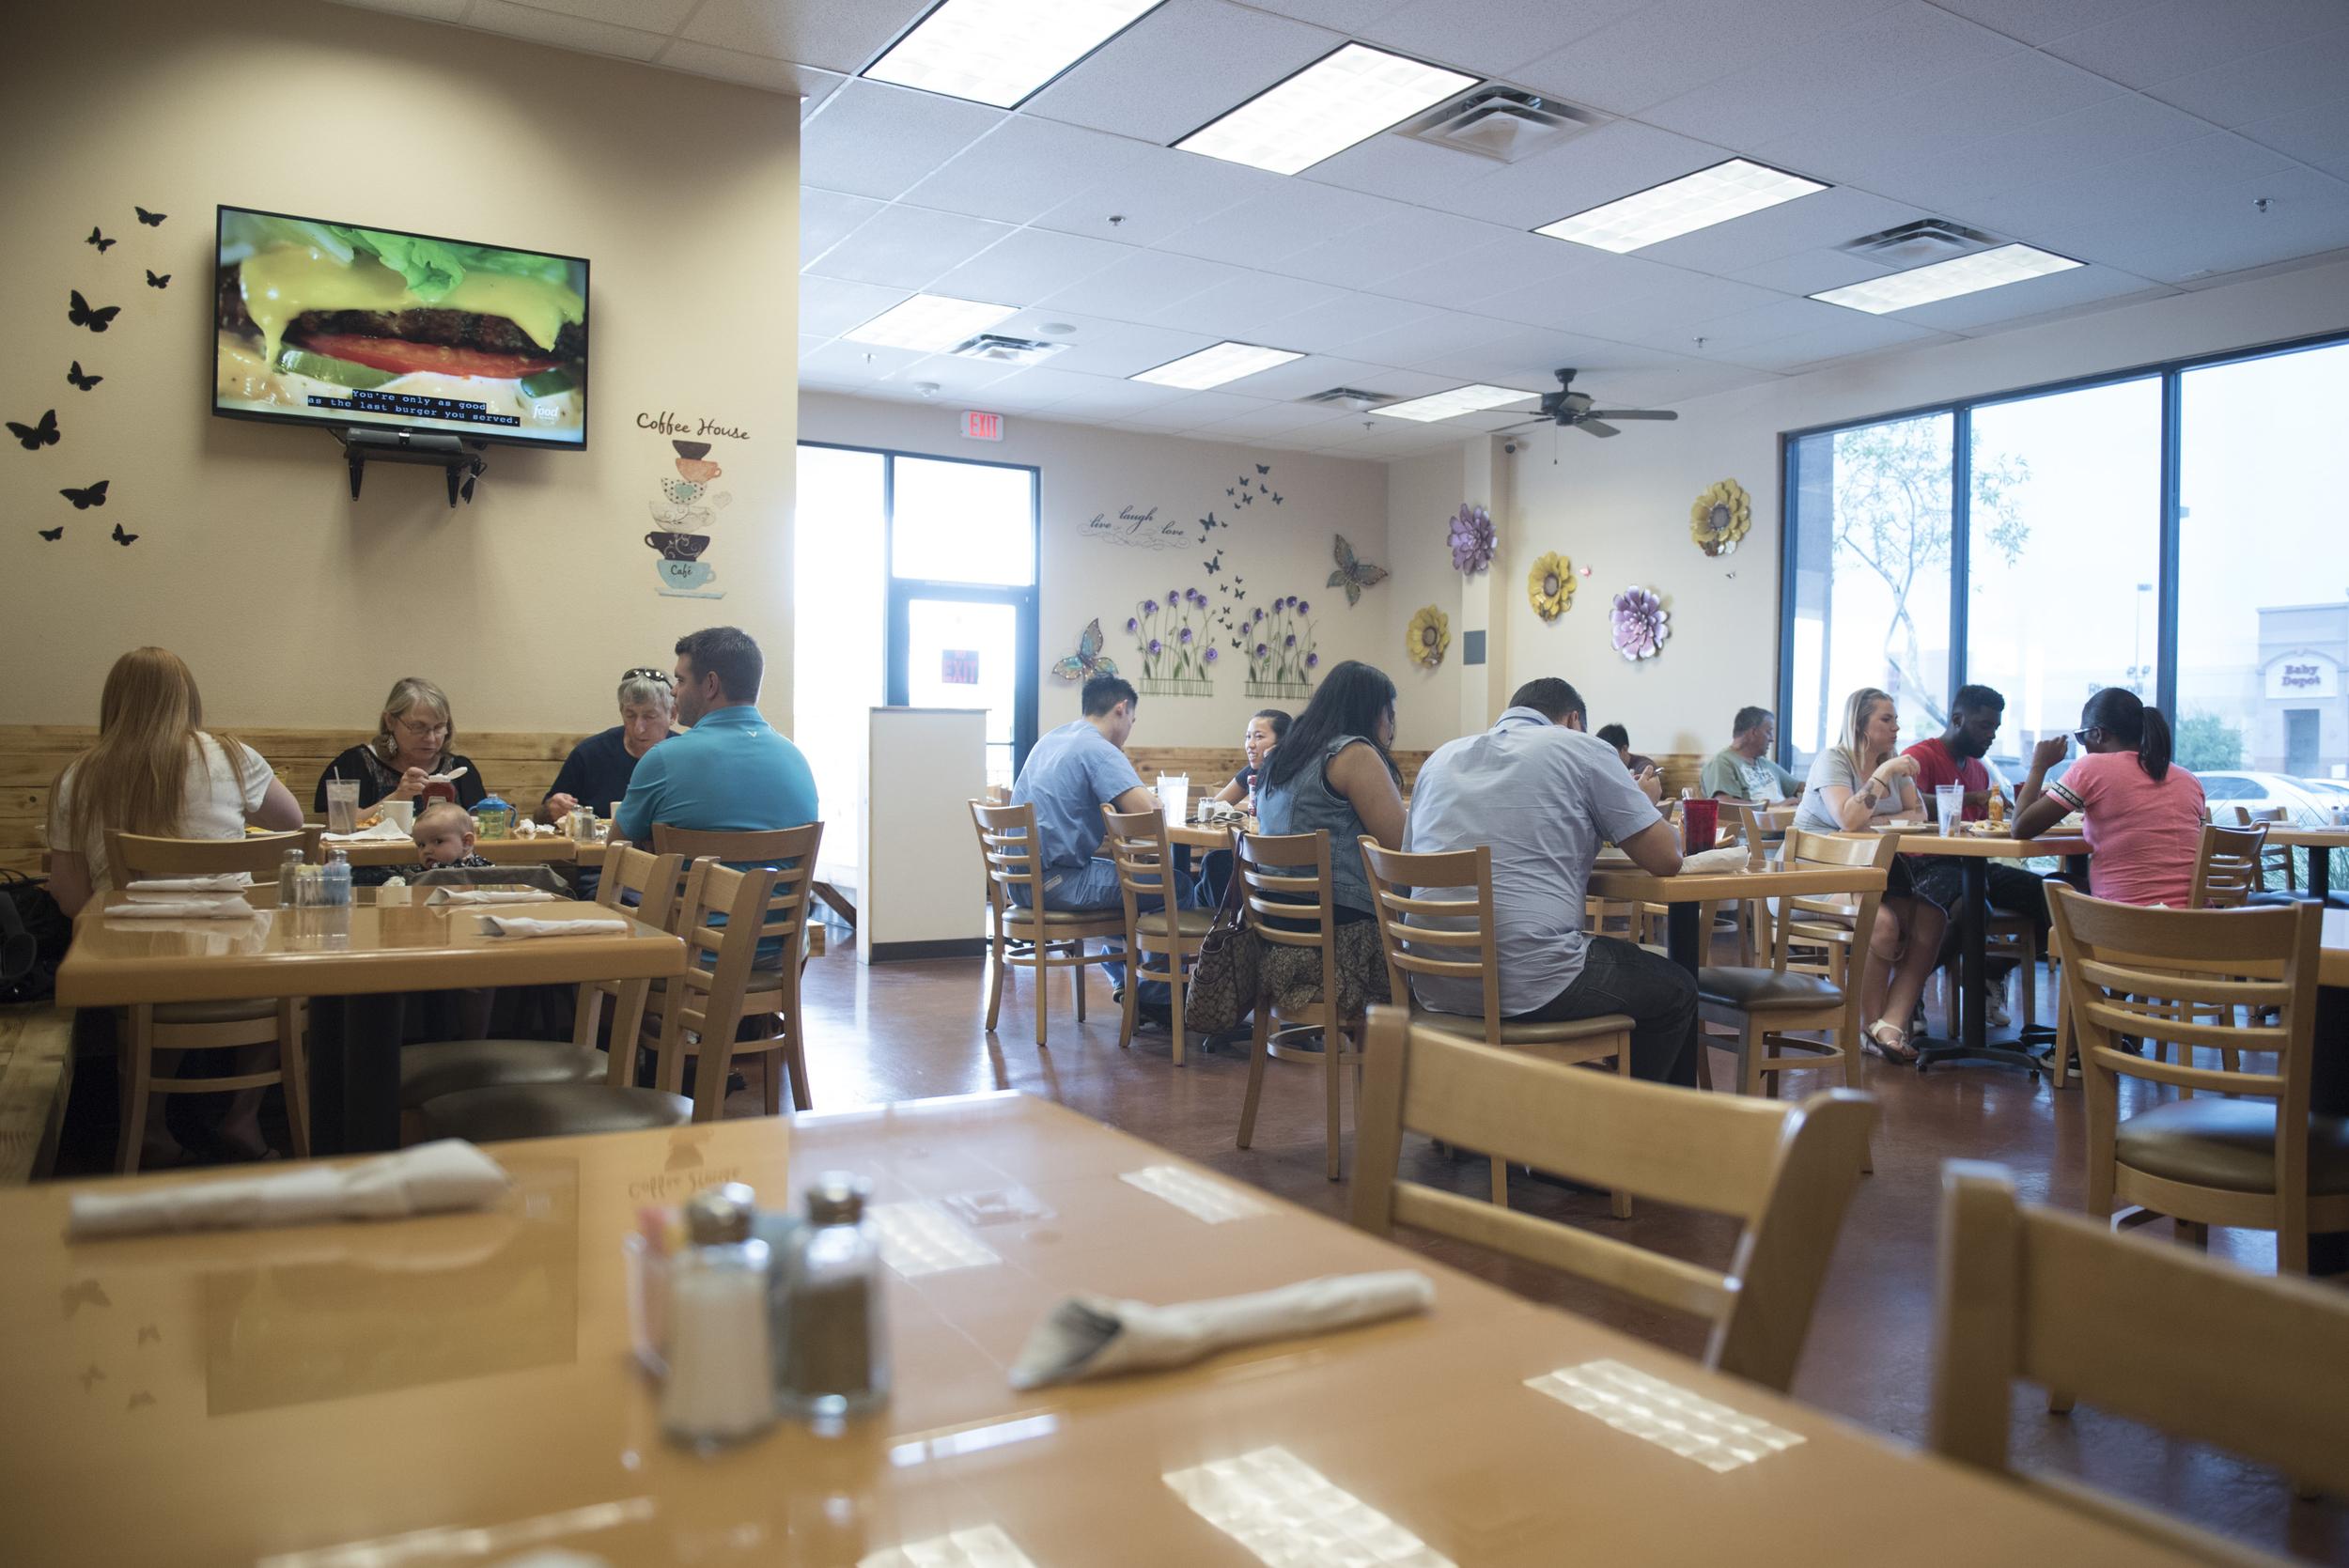 The dining area is shown at BabyStacks in Henderson, Friday, June 26, 2015.(Jason Ogulnik/Las Vegas Review-Journal)